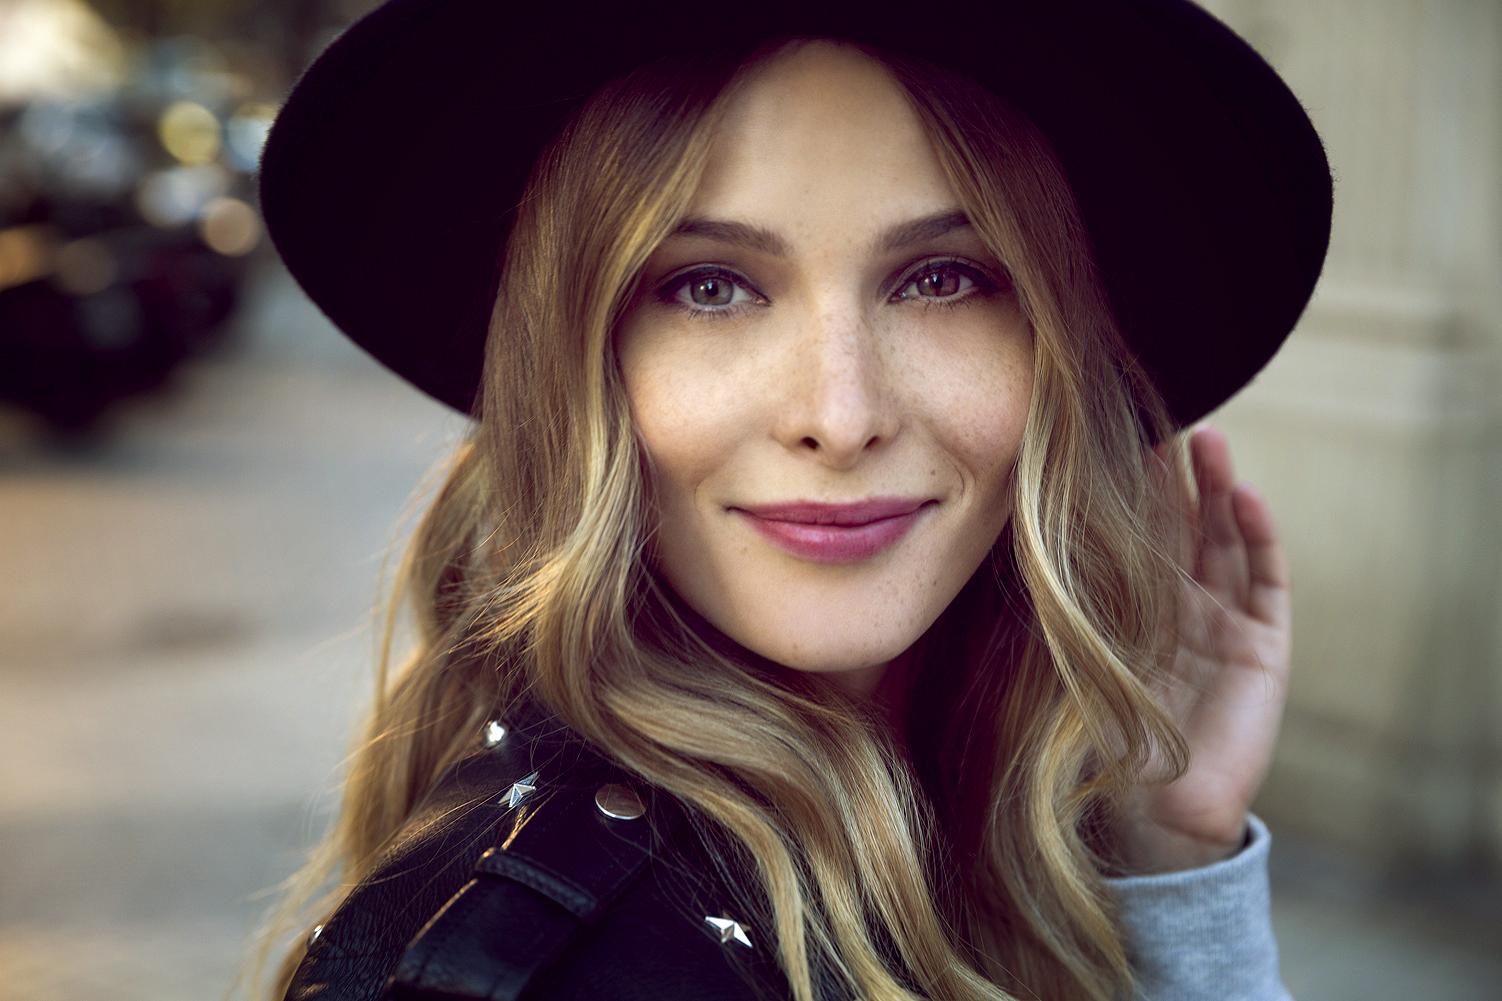 Актриса Светлана Иванова - биография, личная жизнь